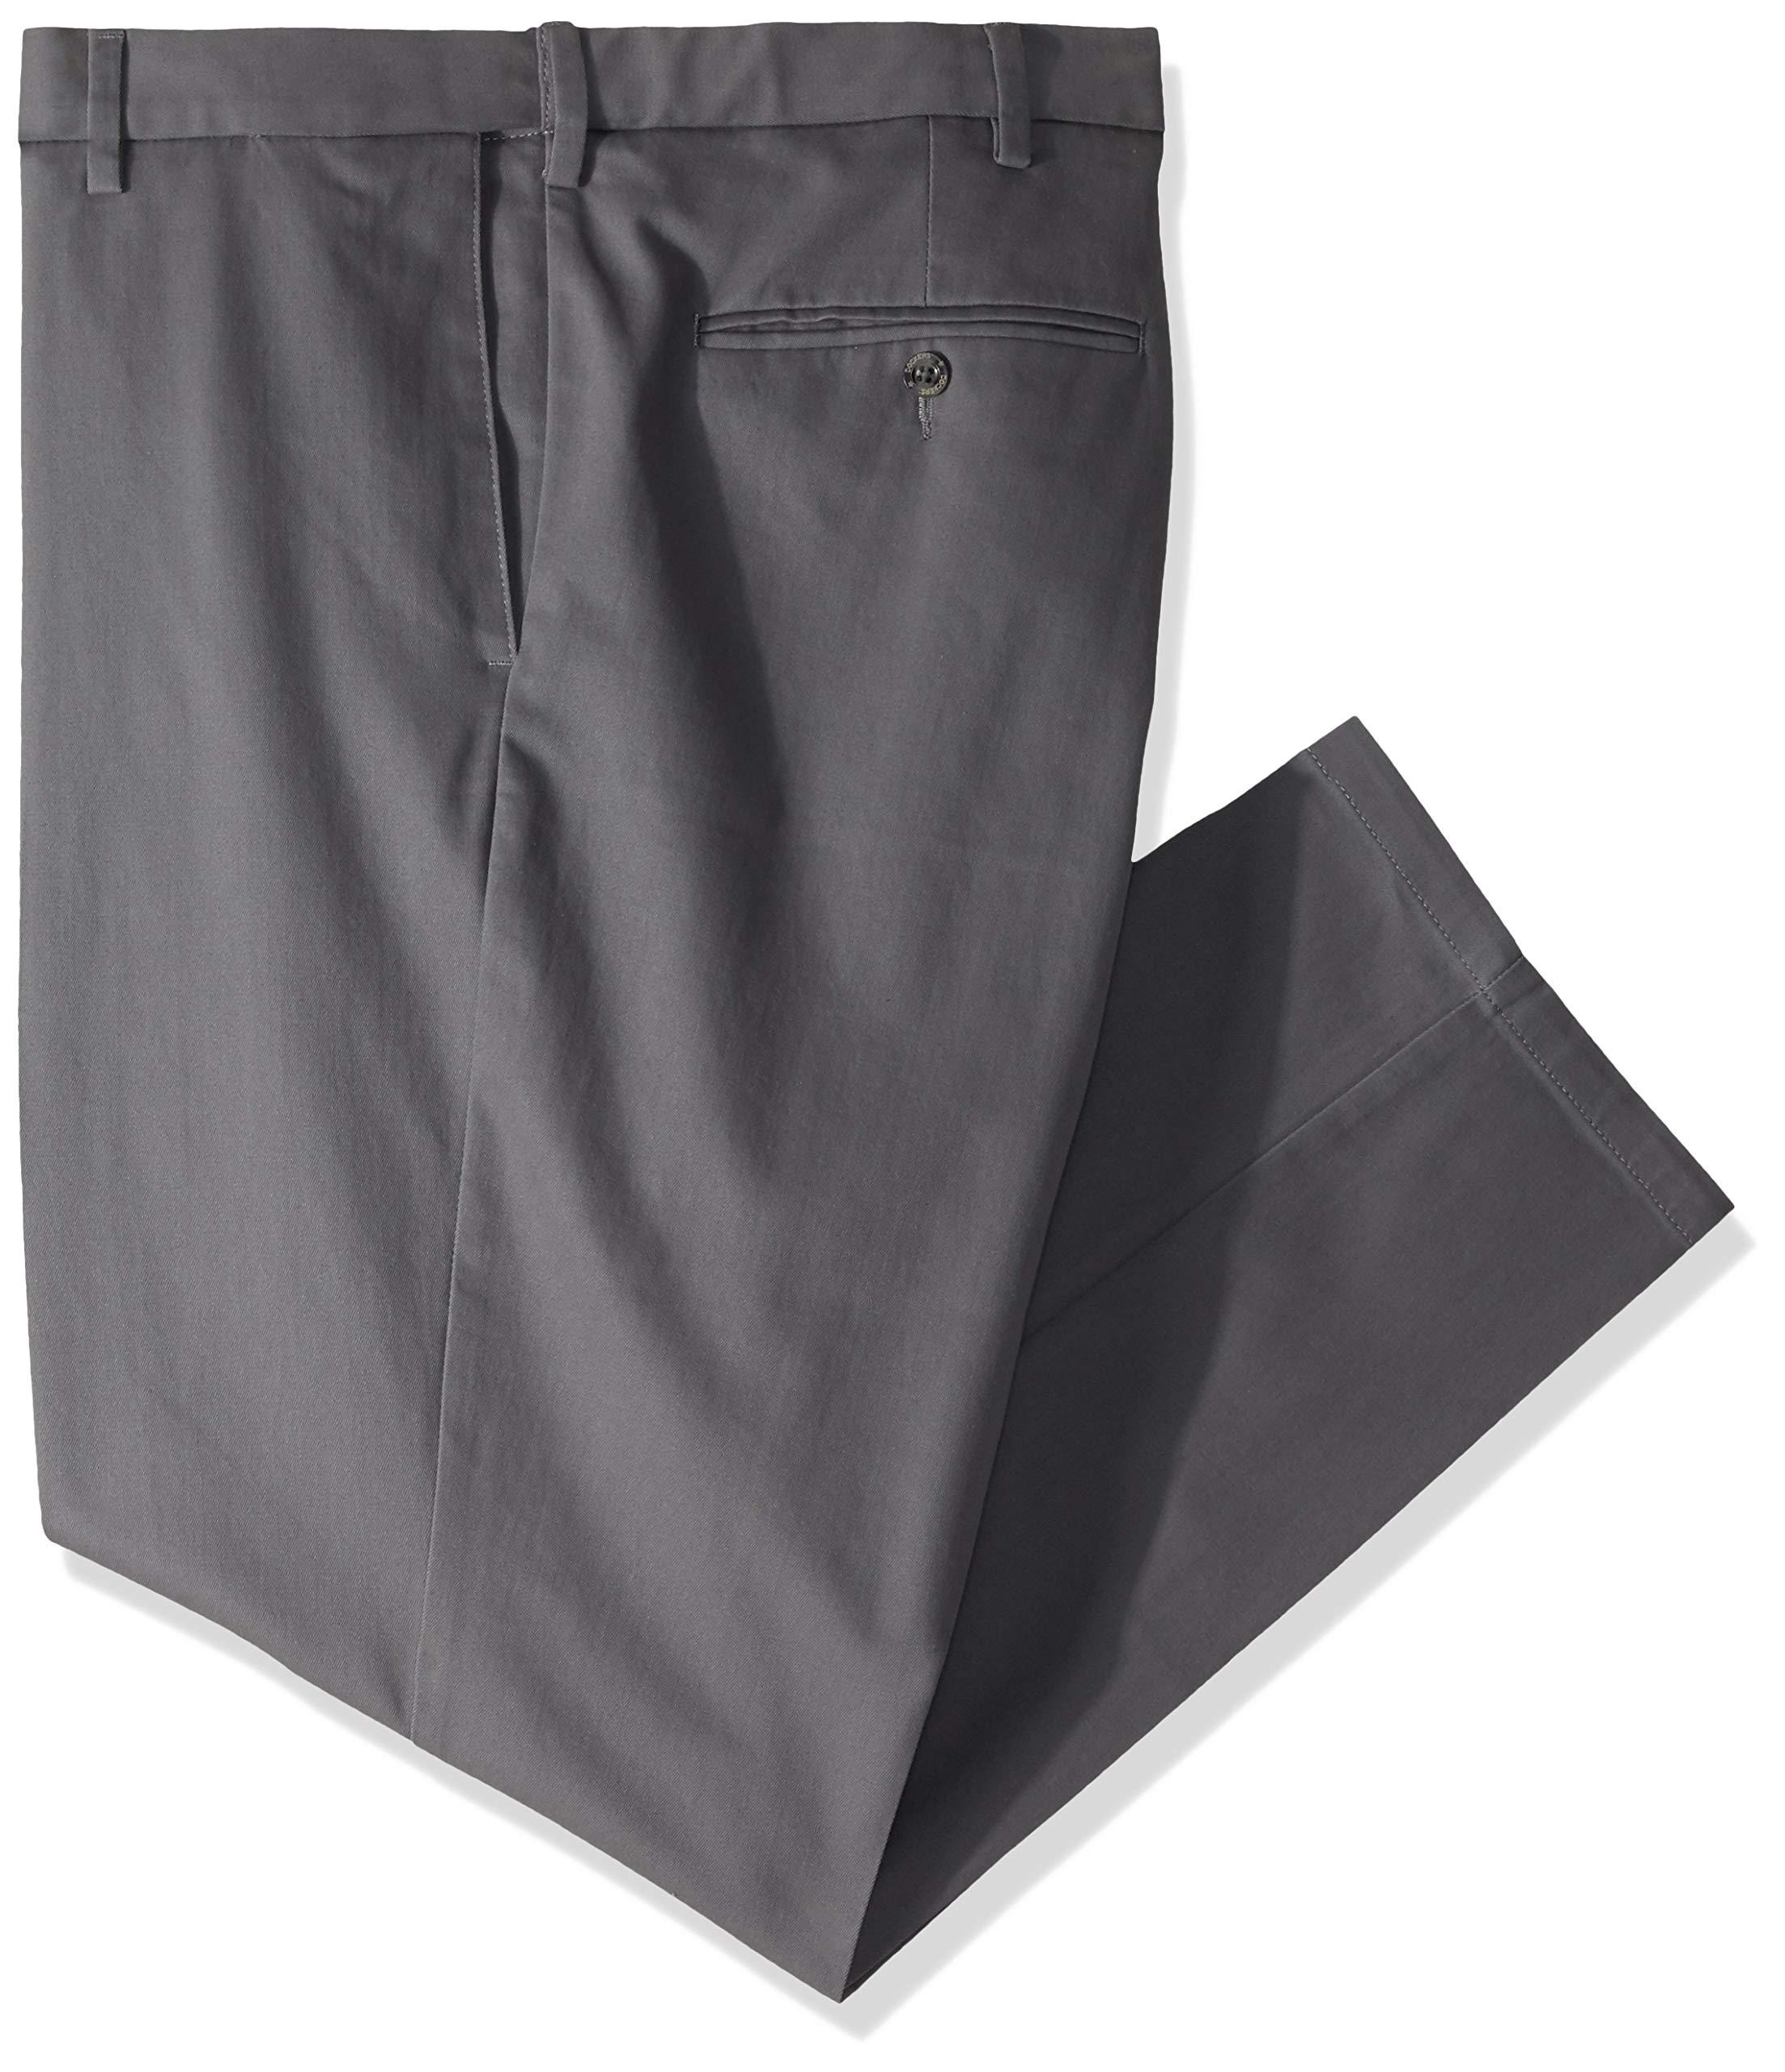 Dockers Men's Big and Tall Modern Tapered Fit Signature Khaki Pants, Burma Grey, 48W x 29L by Dockers (Image #2)